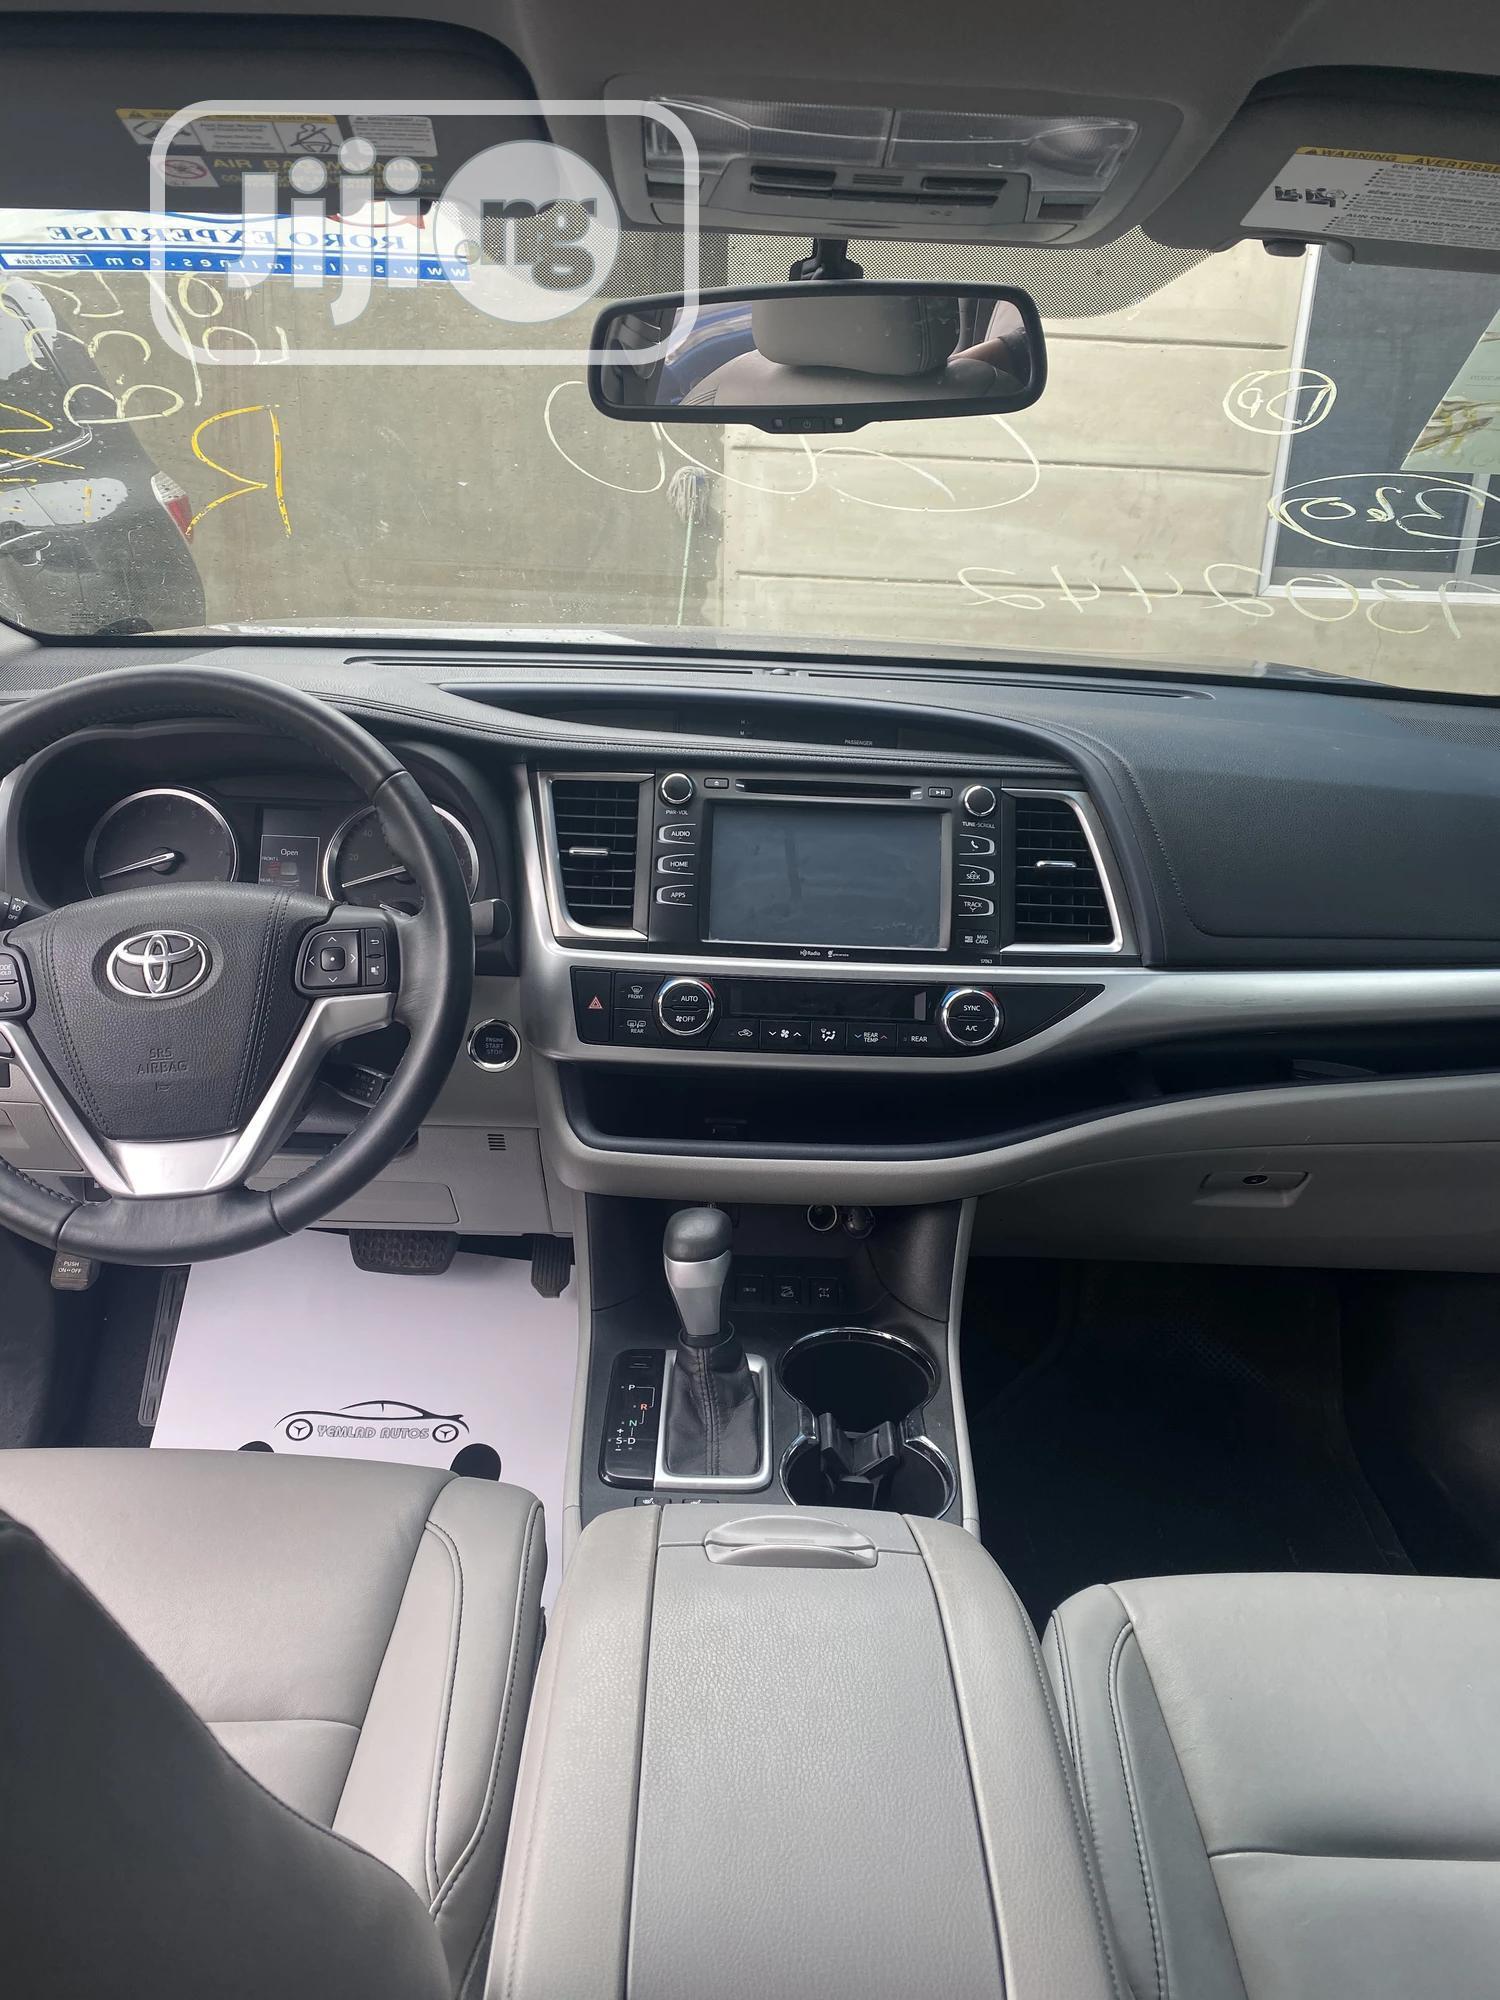 Toyota Highlander 2015 Gray | Cars for sale in Ibadan, Oyo State, Nigeria